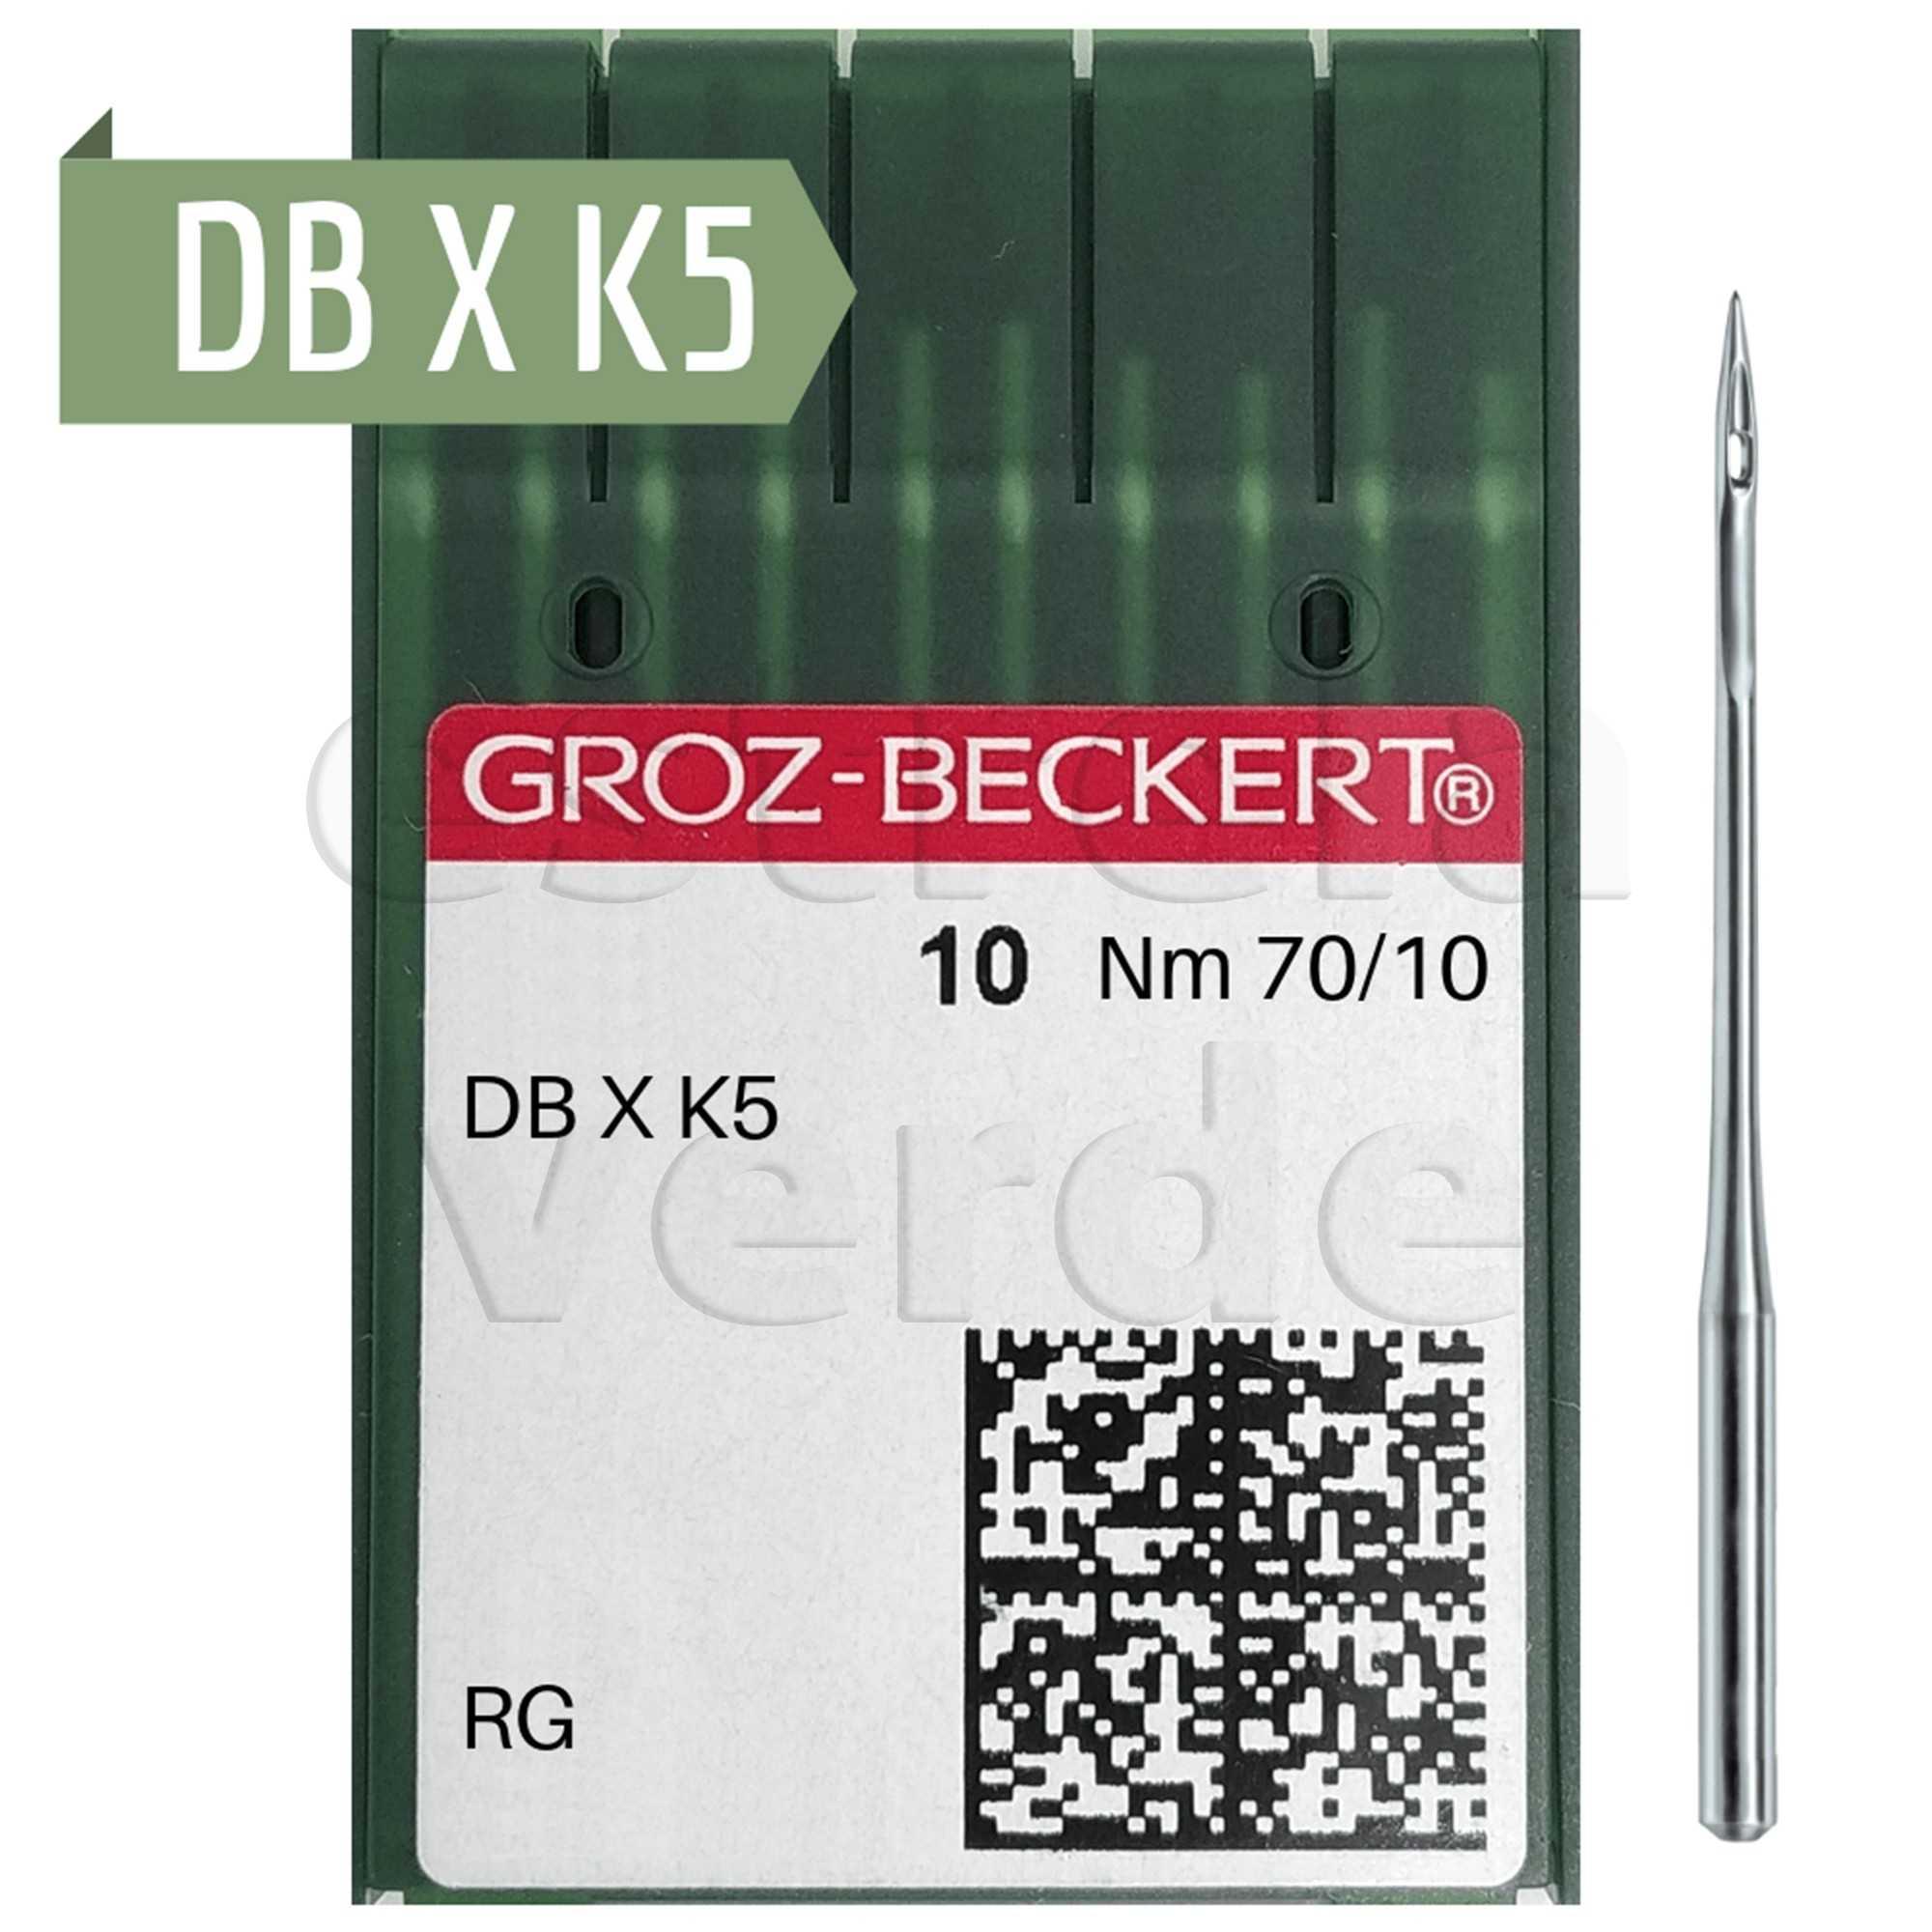 AGULHA BORDADEIRA DBXK5 70 FFG 10UN (783992)  - Estrela Verde